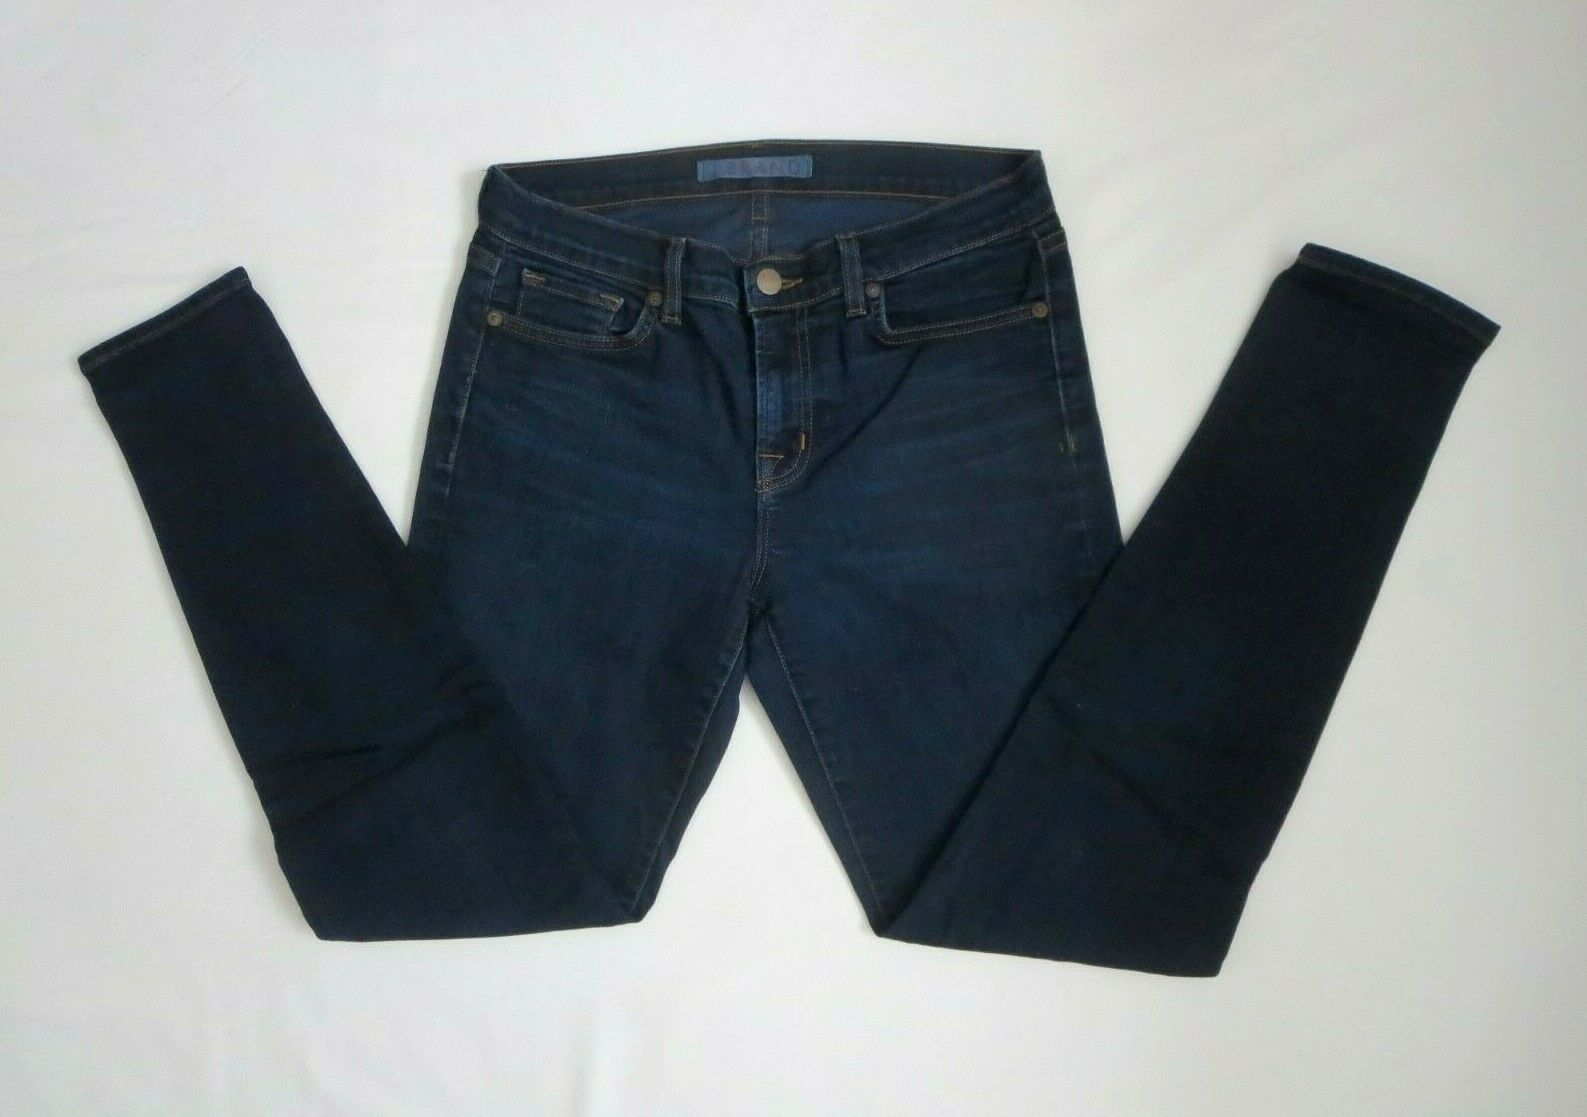 J Brand Skinny Leg Jeans Size 28 Ignite Wash